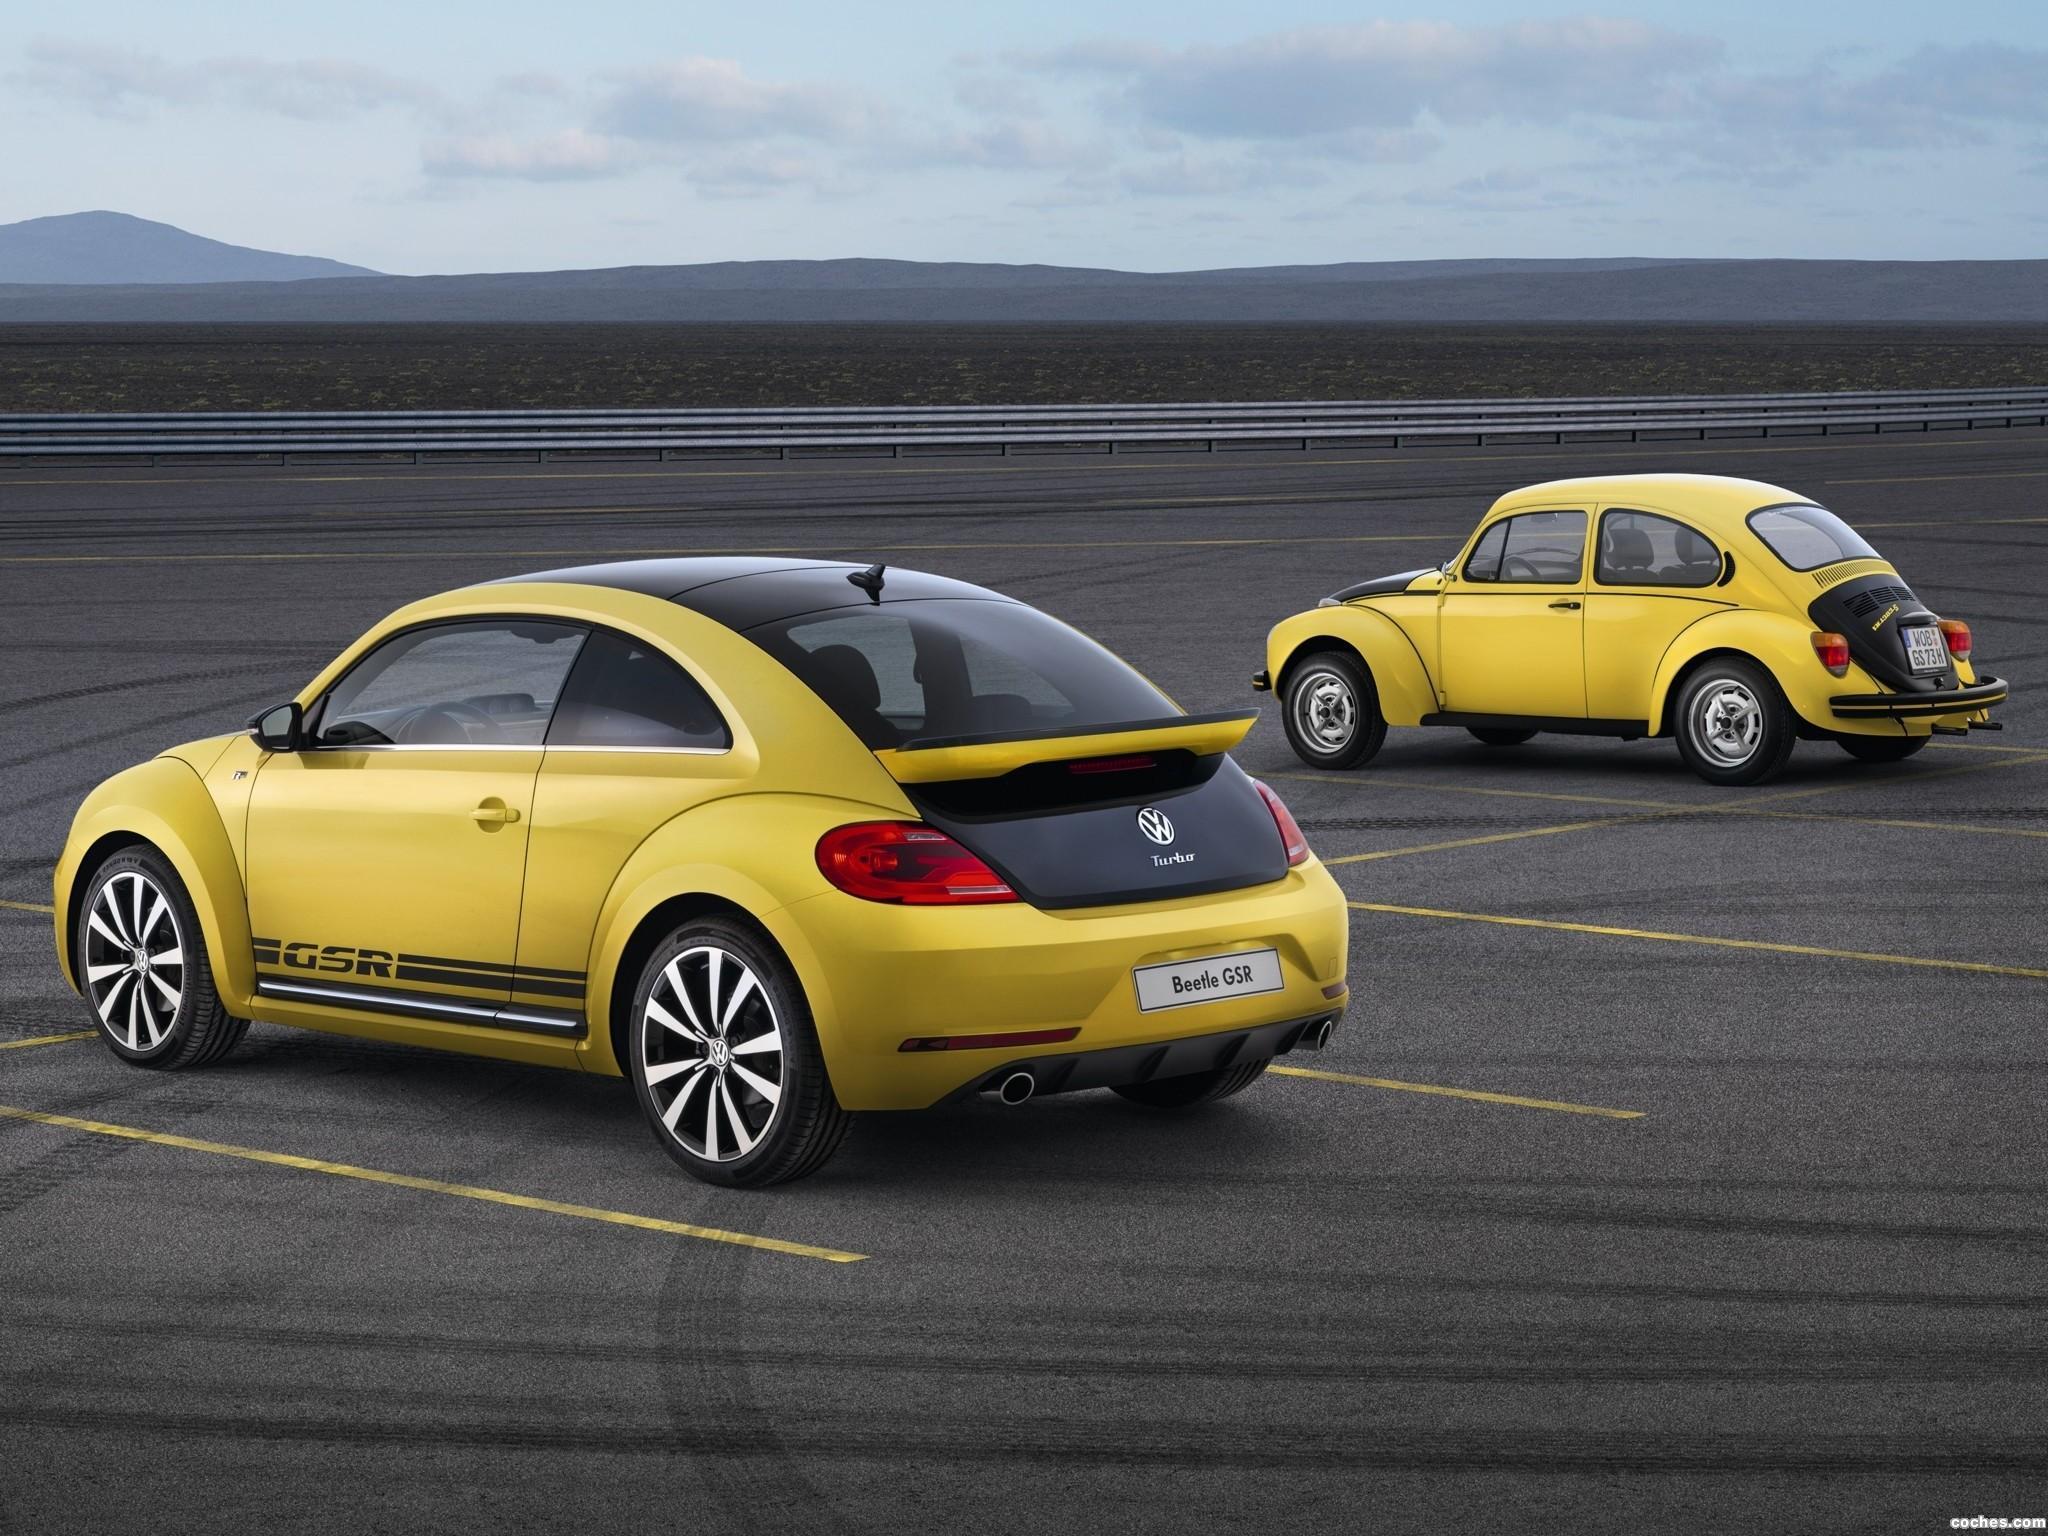 Foto 1 de Volkswagen Beetle GSR Limited Edition 2013